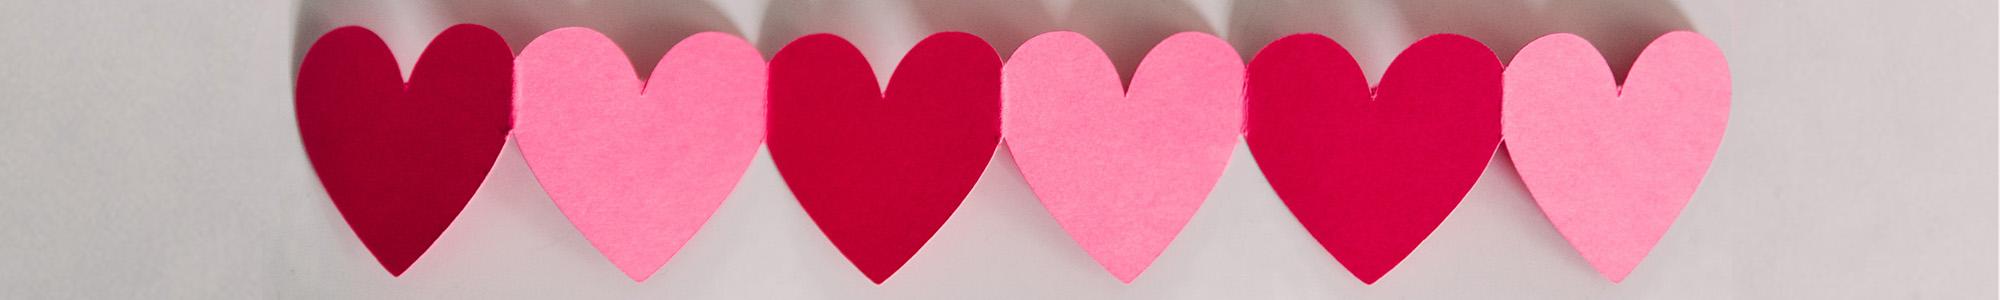 Valentines Day Retail Buying Calendar